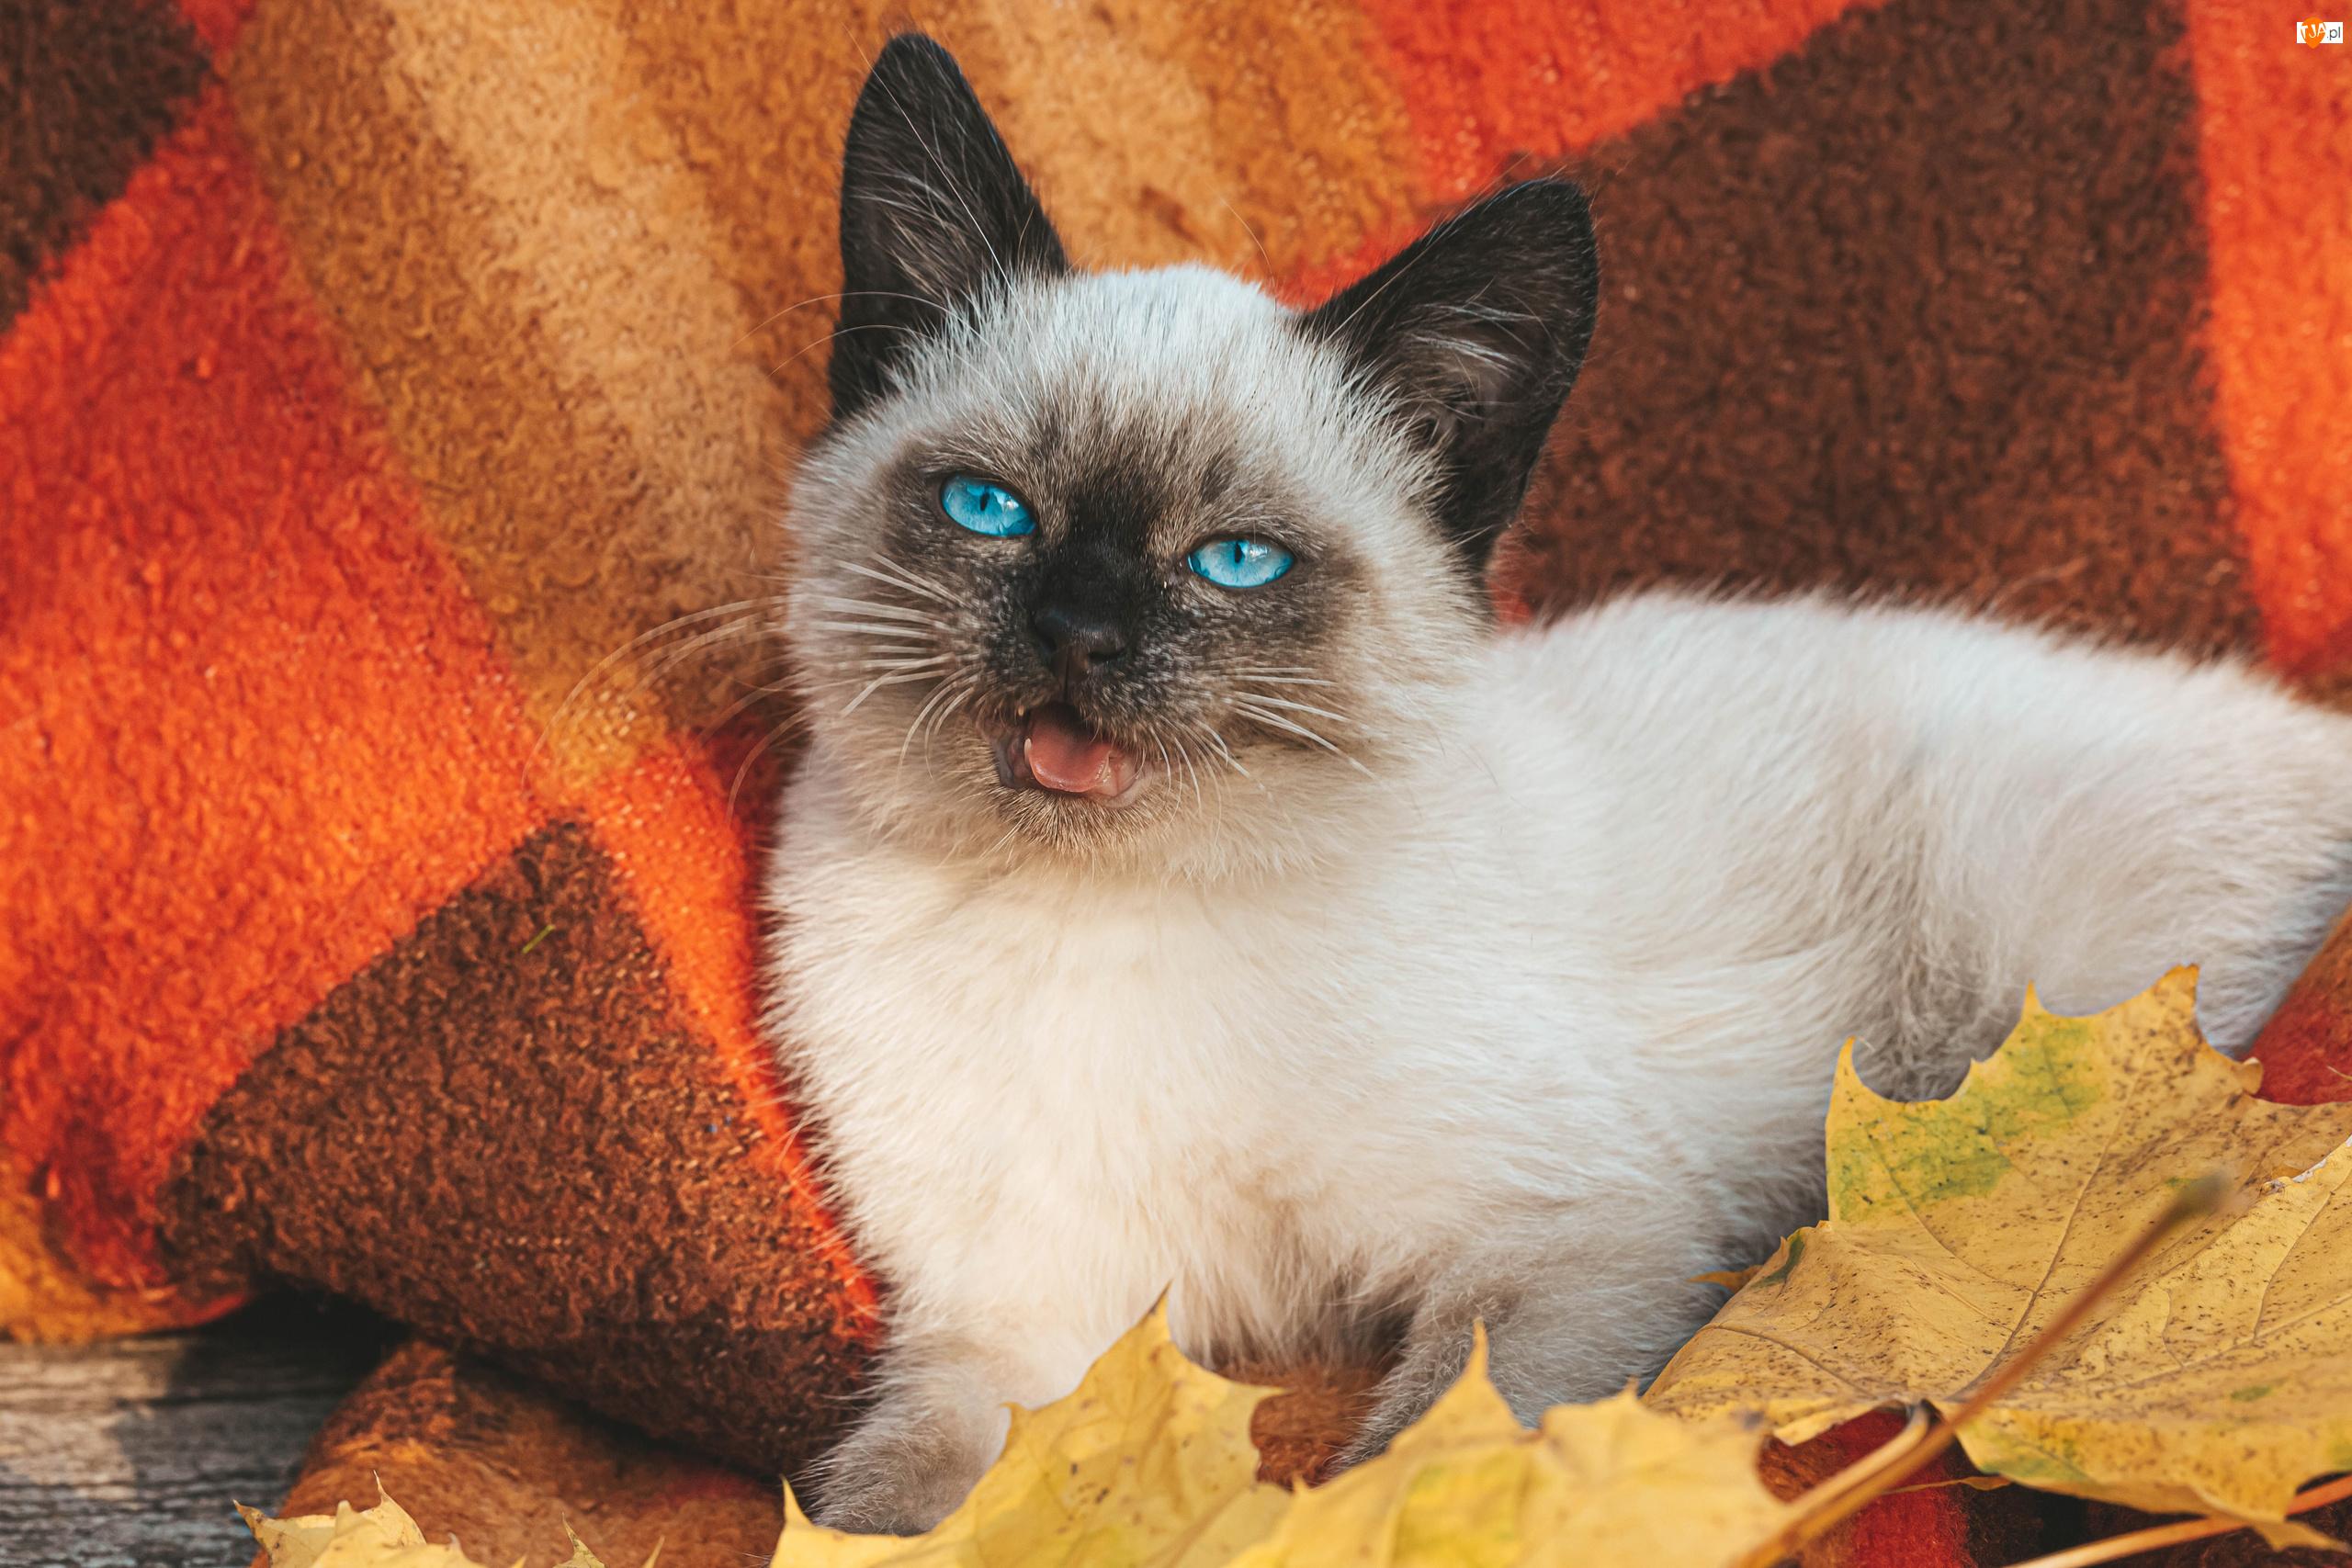 Liście, Kot syjamski, Koc